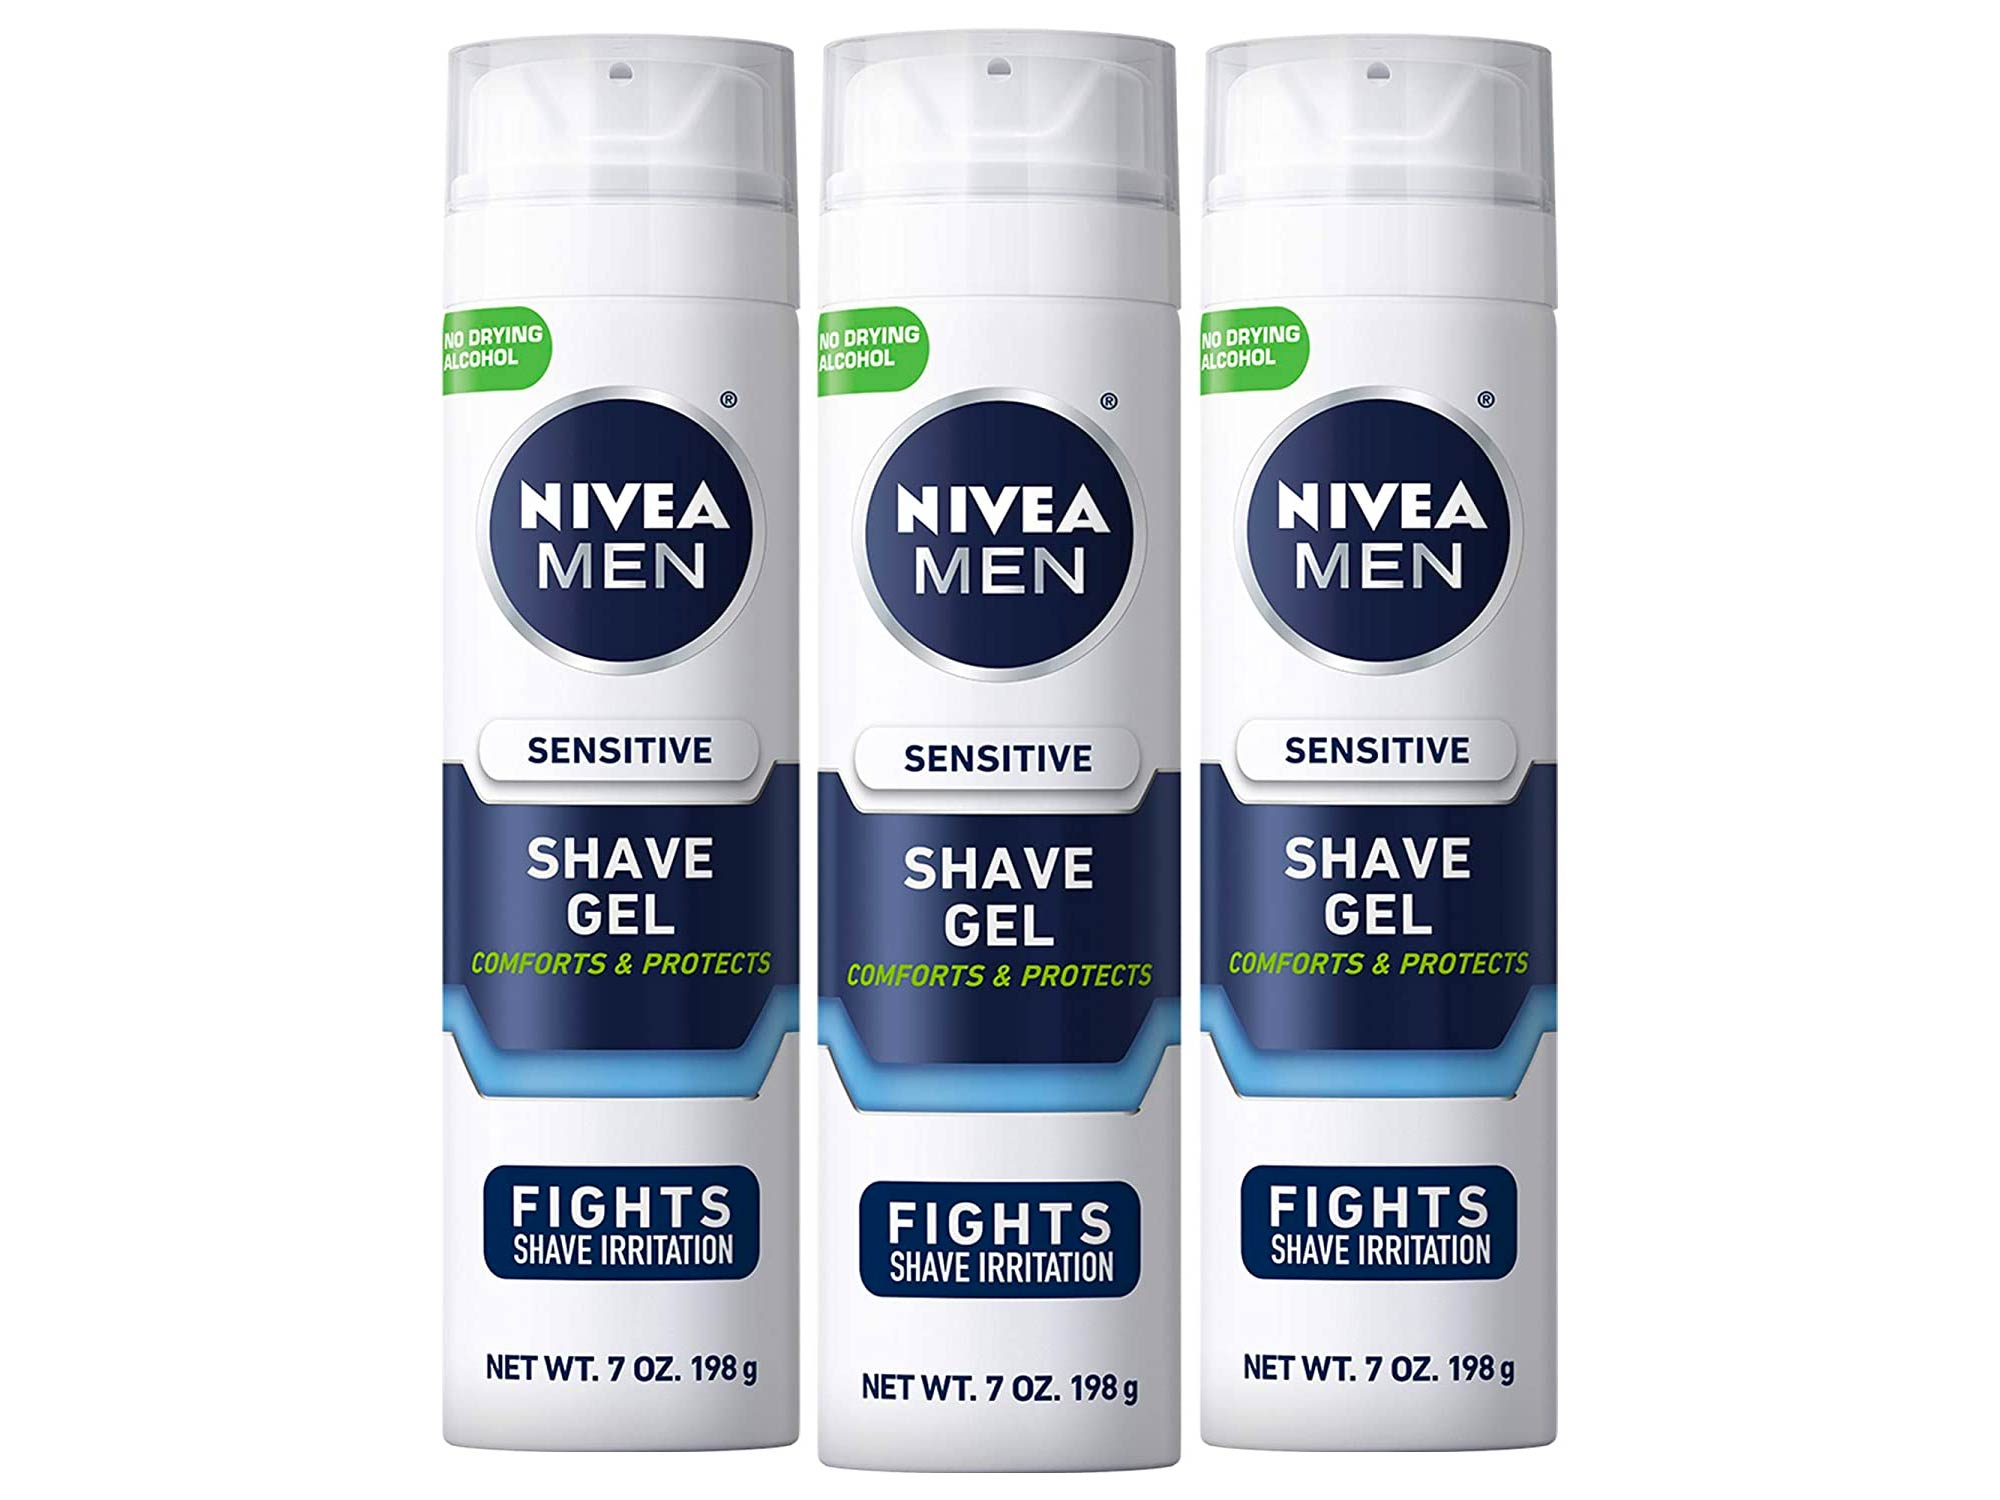 Nivea Men Sensitive Shaving Gel - Protects Sensitive Skin From Shave Irritation - 7 Ounce (Pack of 3)